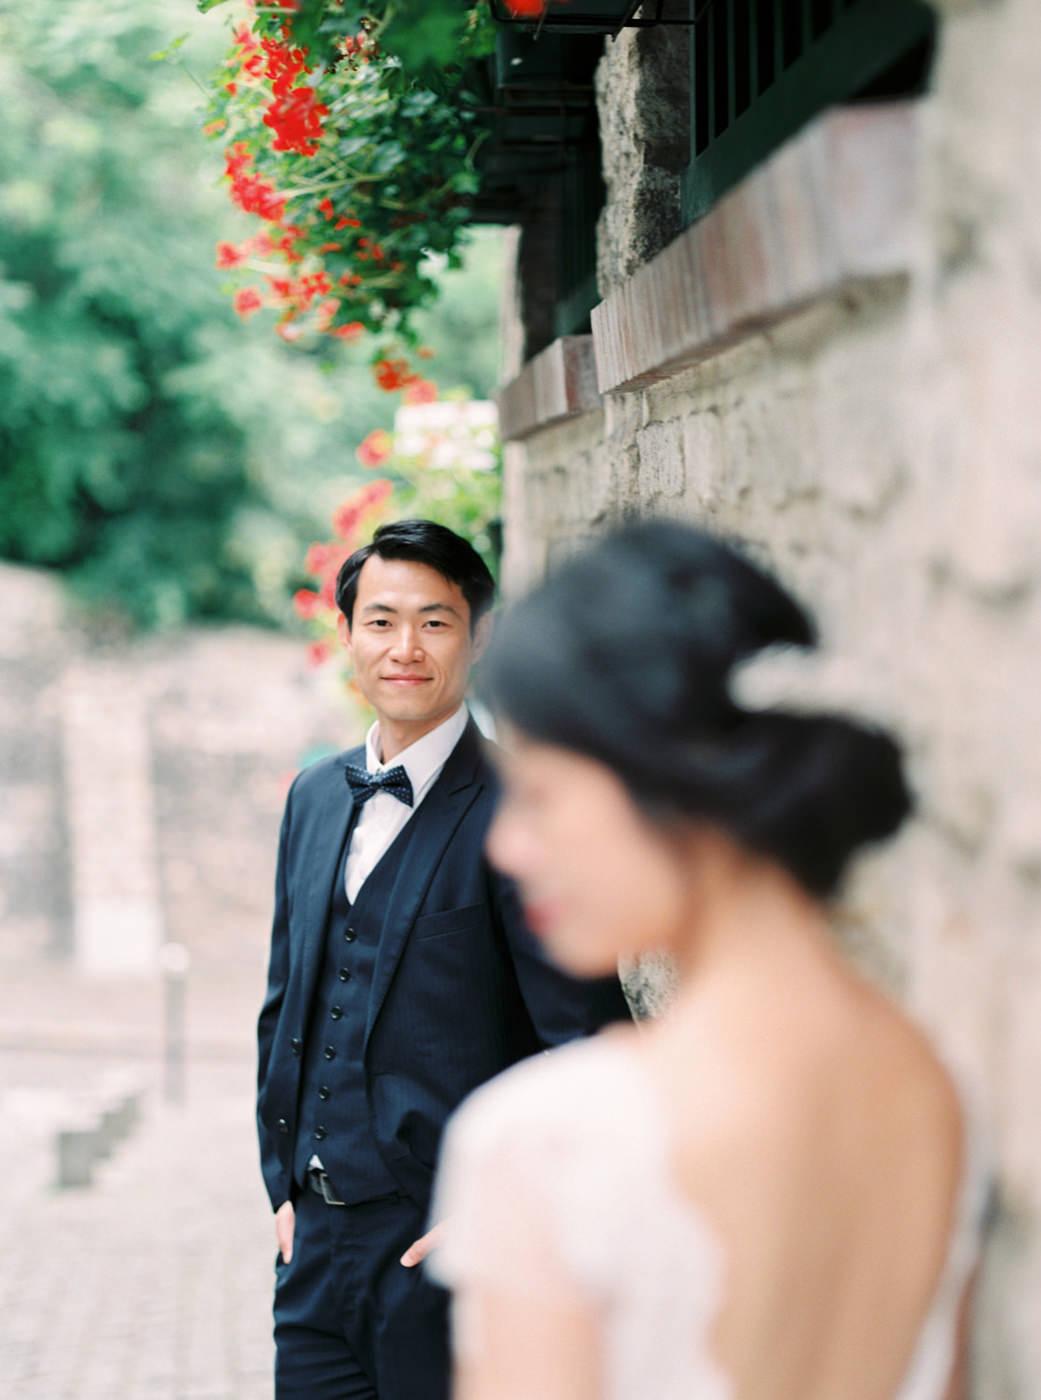 Intimate_Paris_Wedding_Montmatre_Photoshoot_Engagement_session